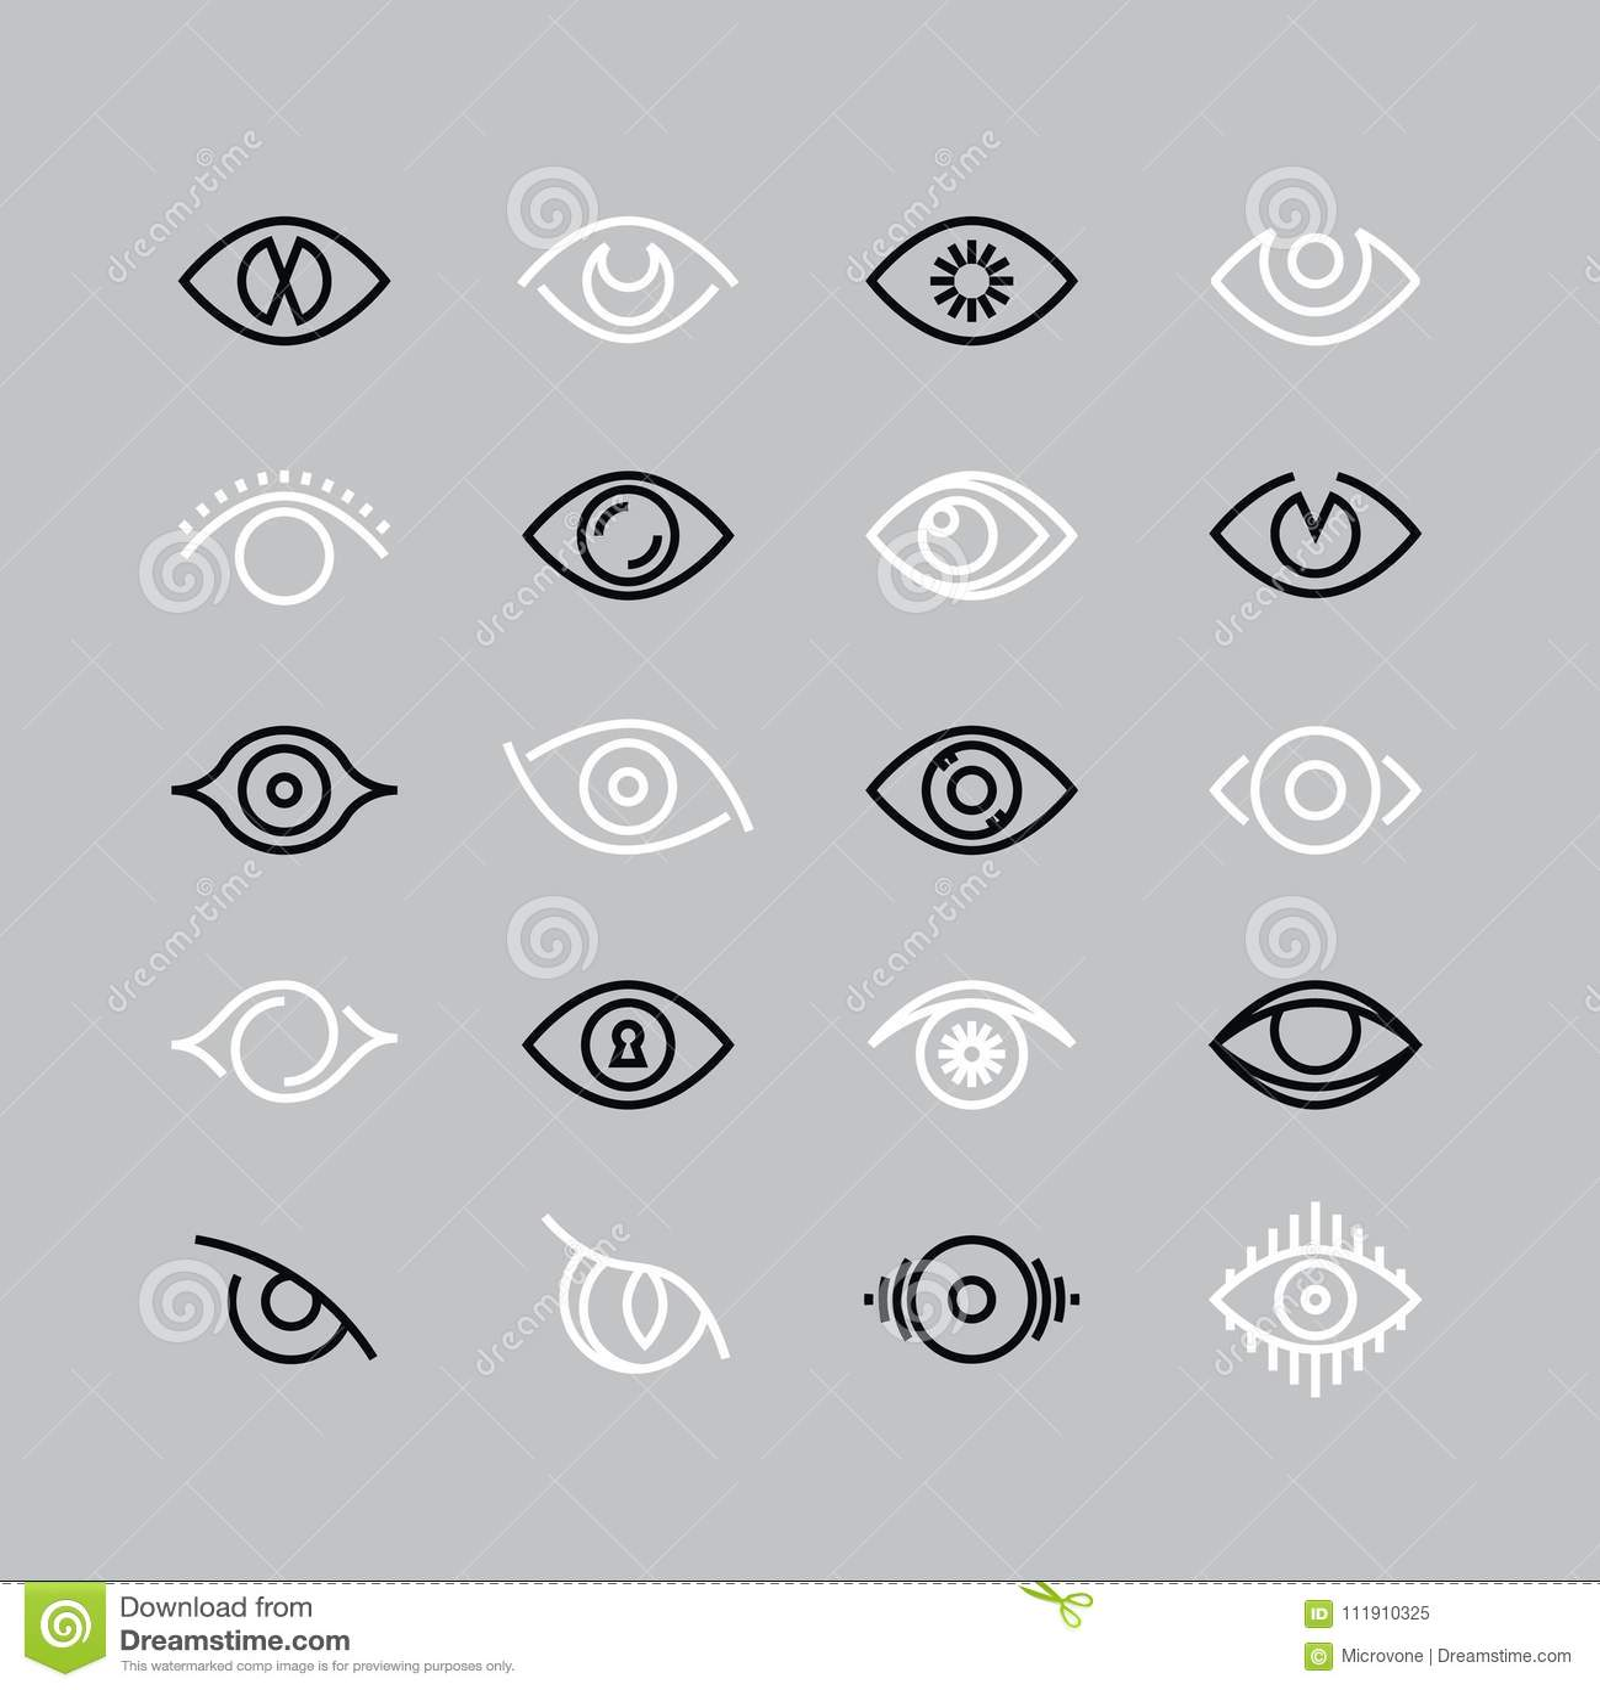 Eyesight Cartoons Illustrations Amp Vector Stock Images